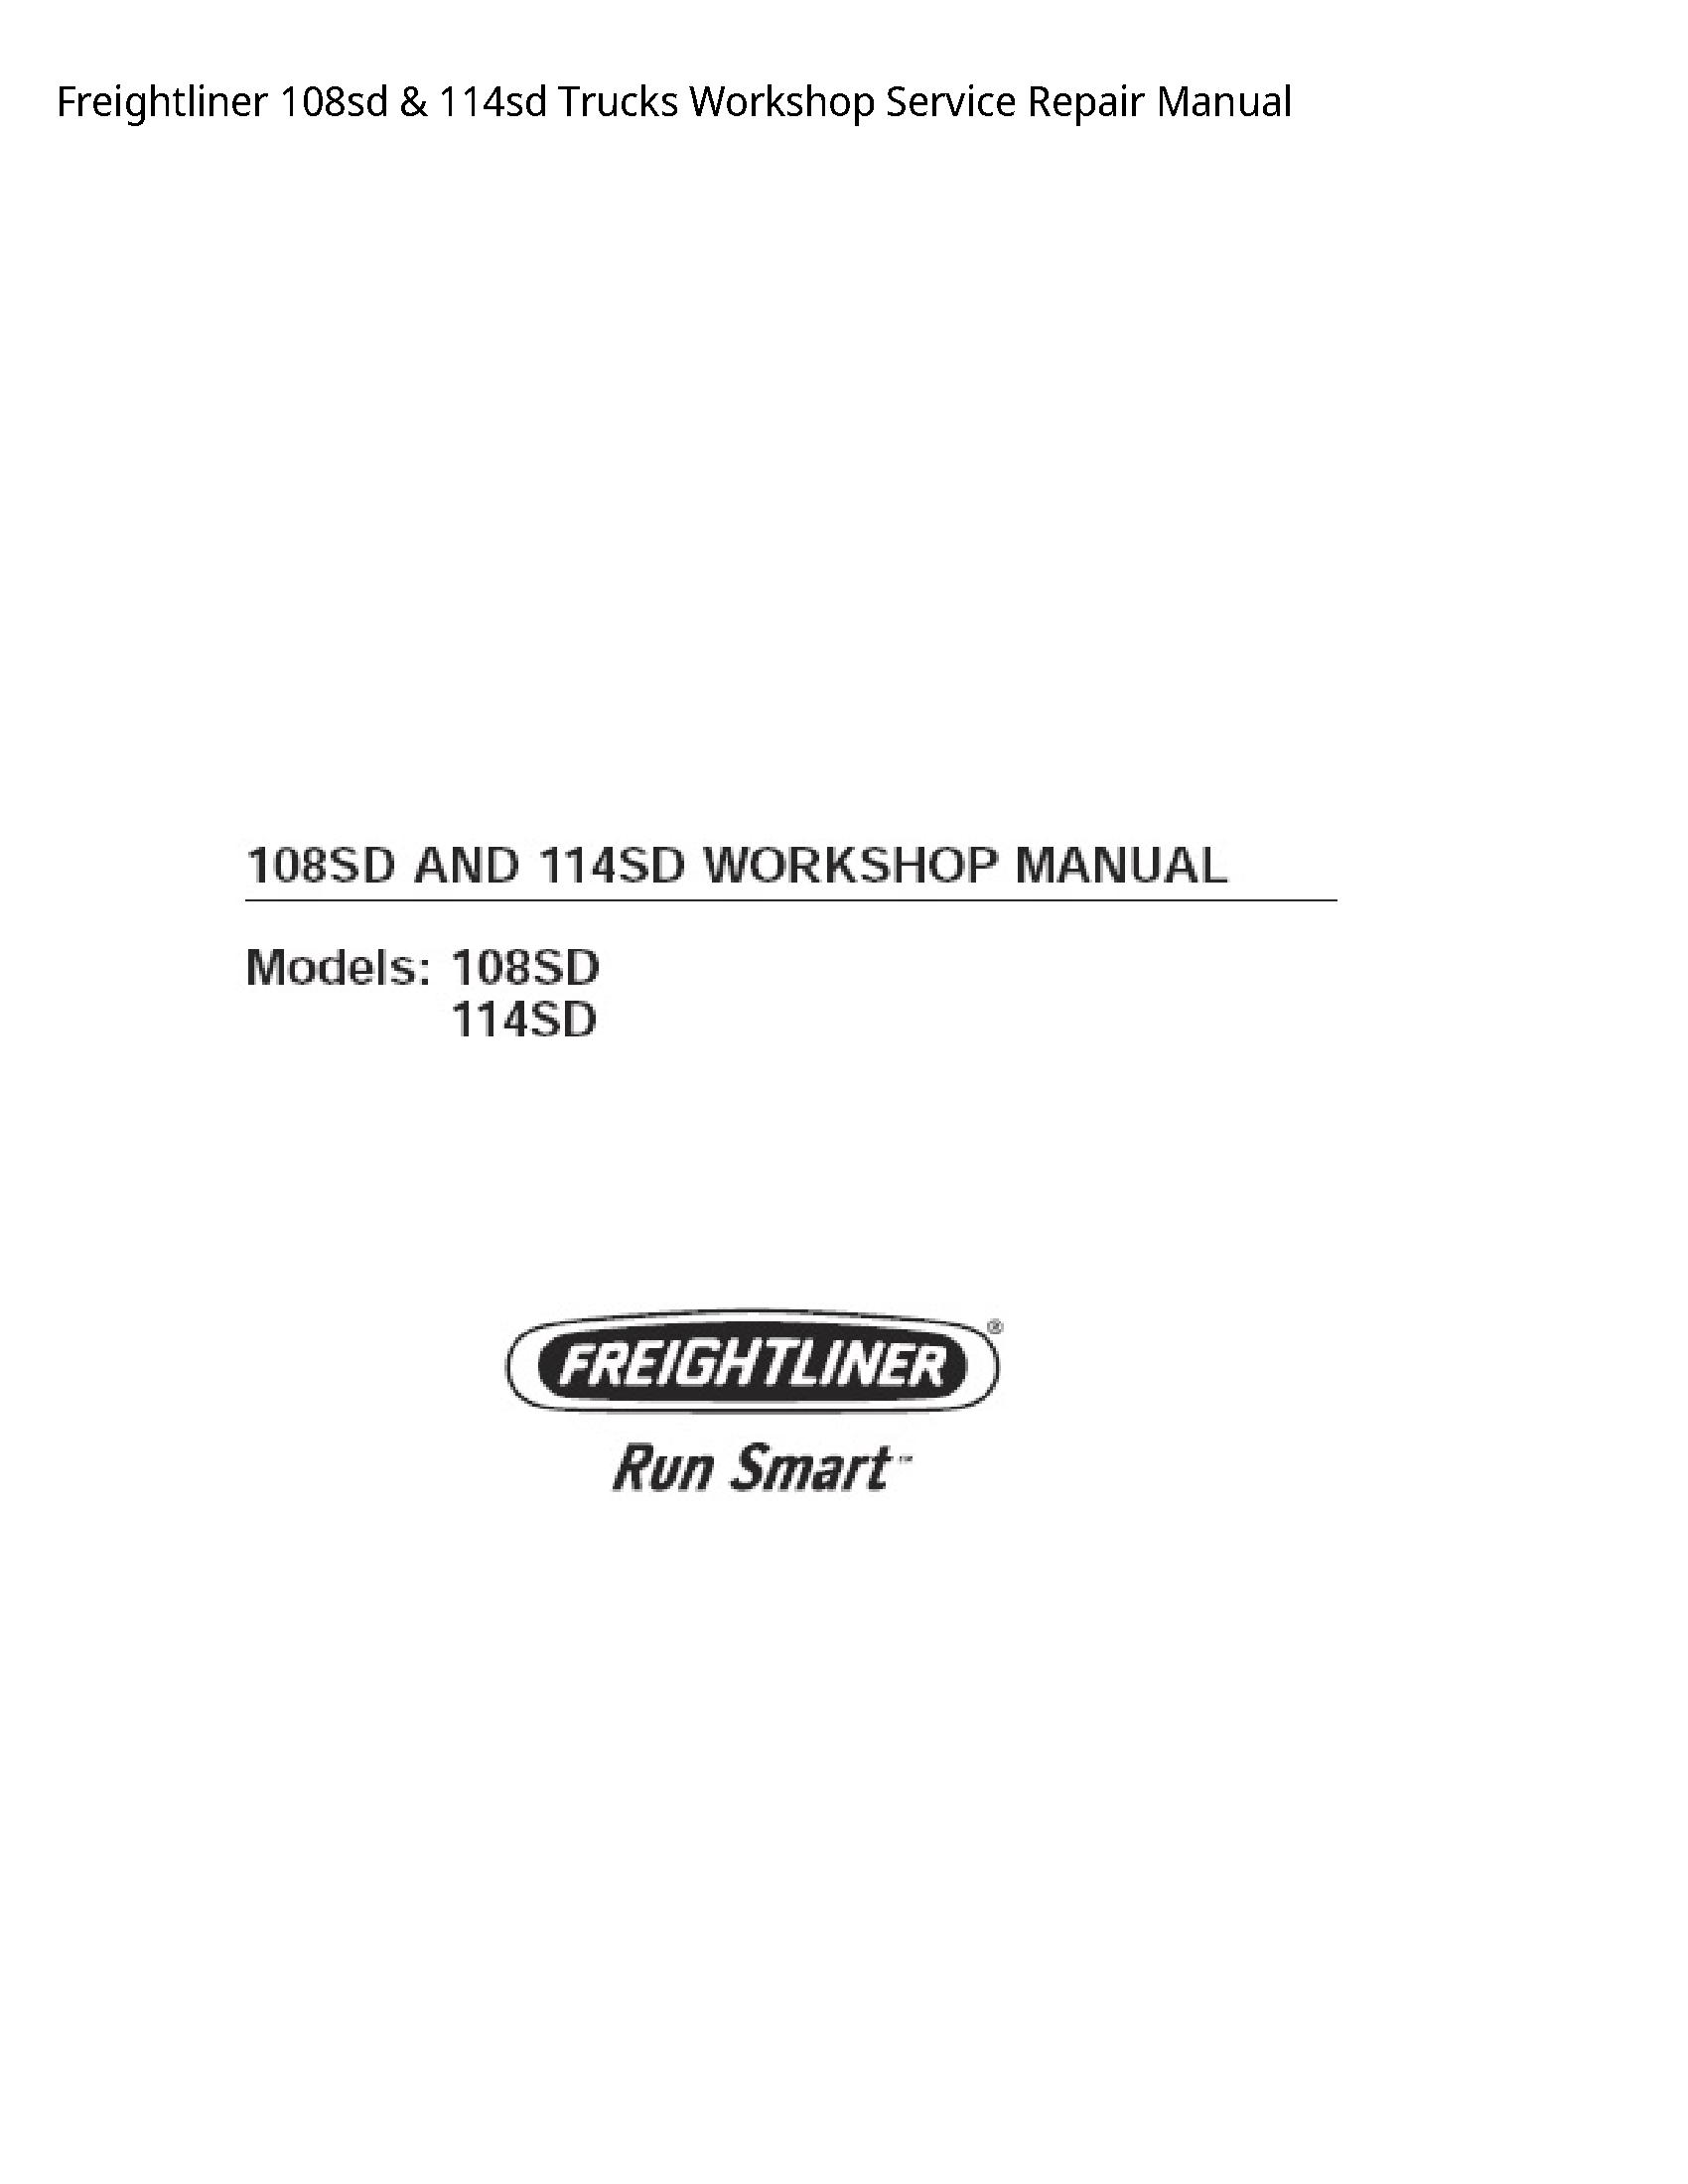 Freightliner 108sd Trucks manual